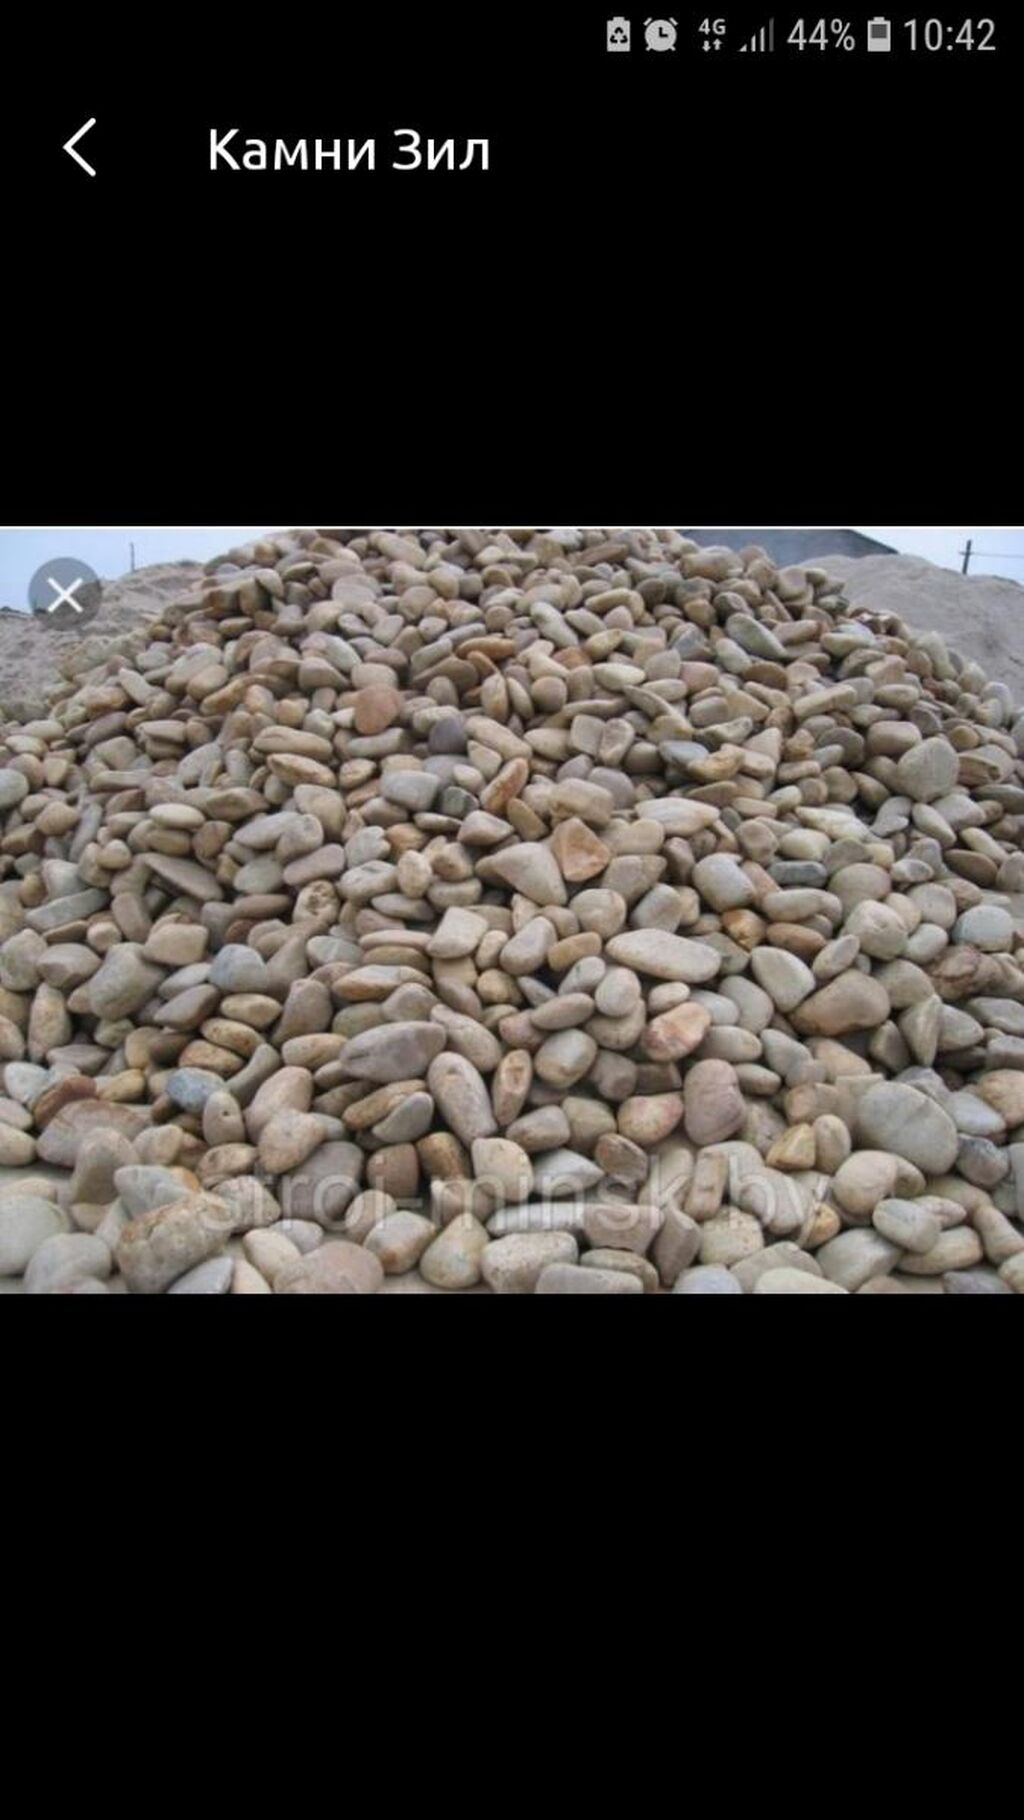 Камень камень камень камень камень камень камень камень камень камень камень камень камень камень камень камень камень камень камень камень камень камень камень камень камень